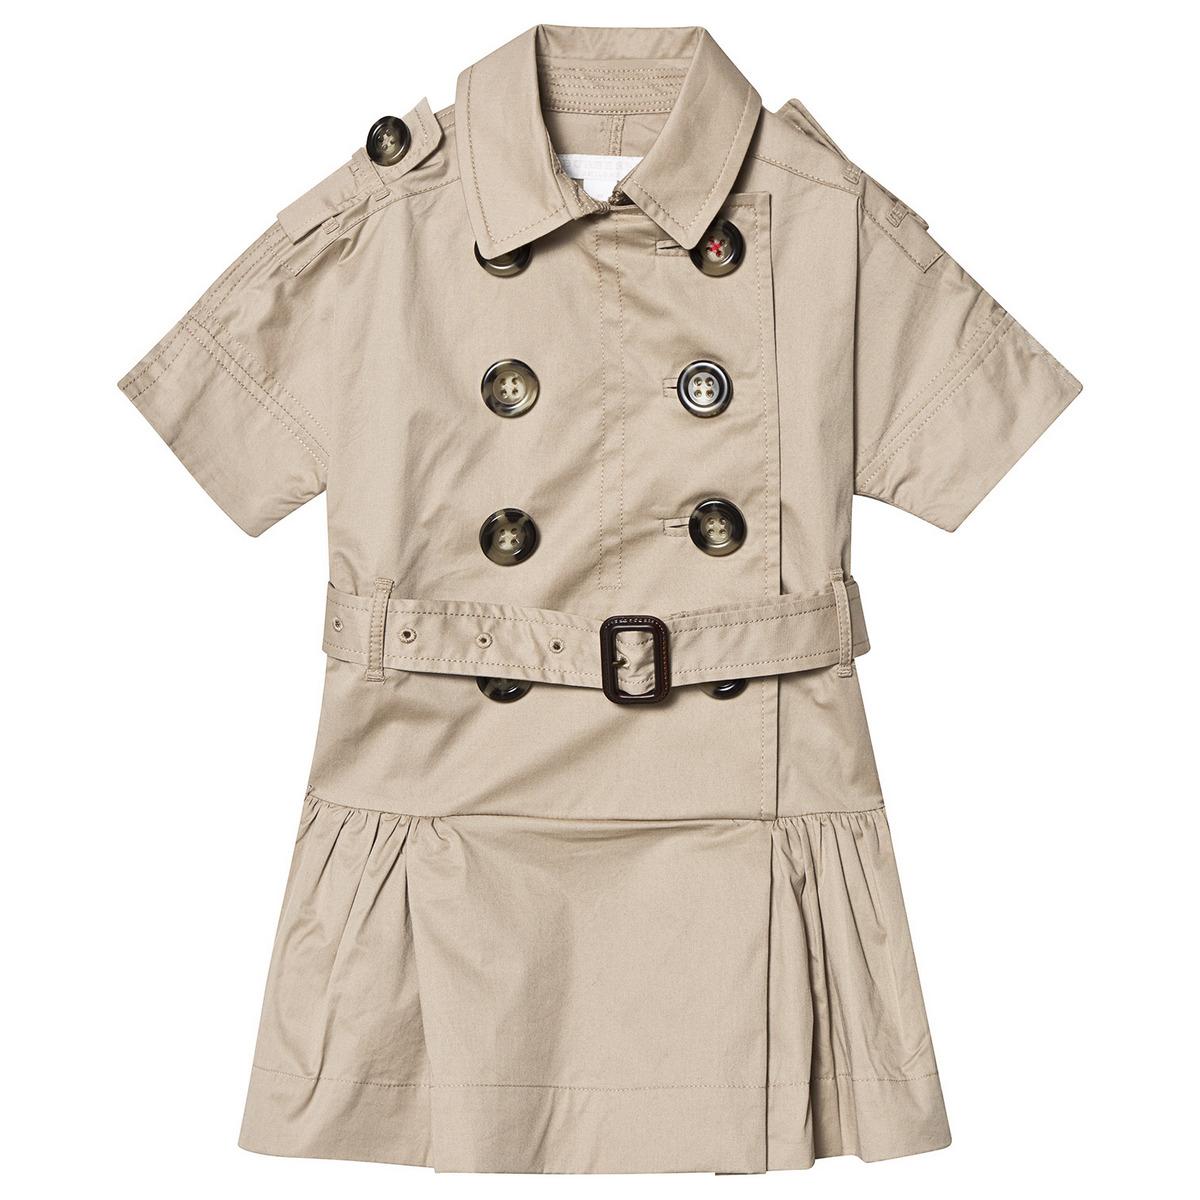 Burberry Beige Cynthie Trench Dress